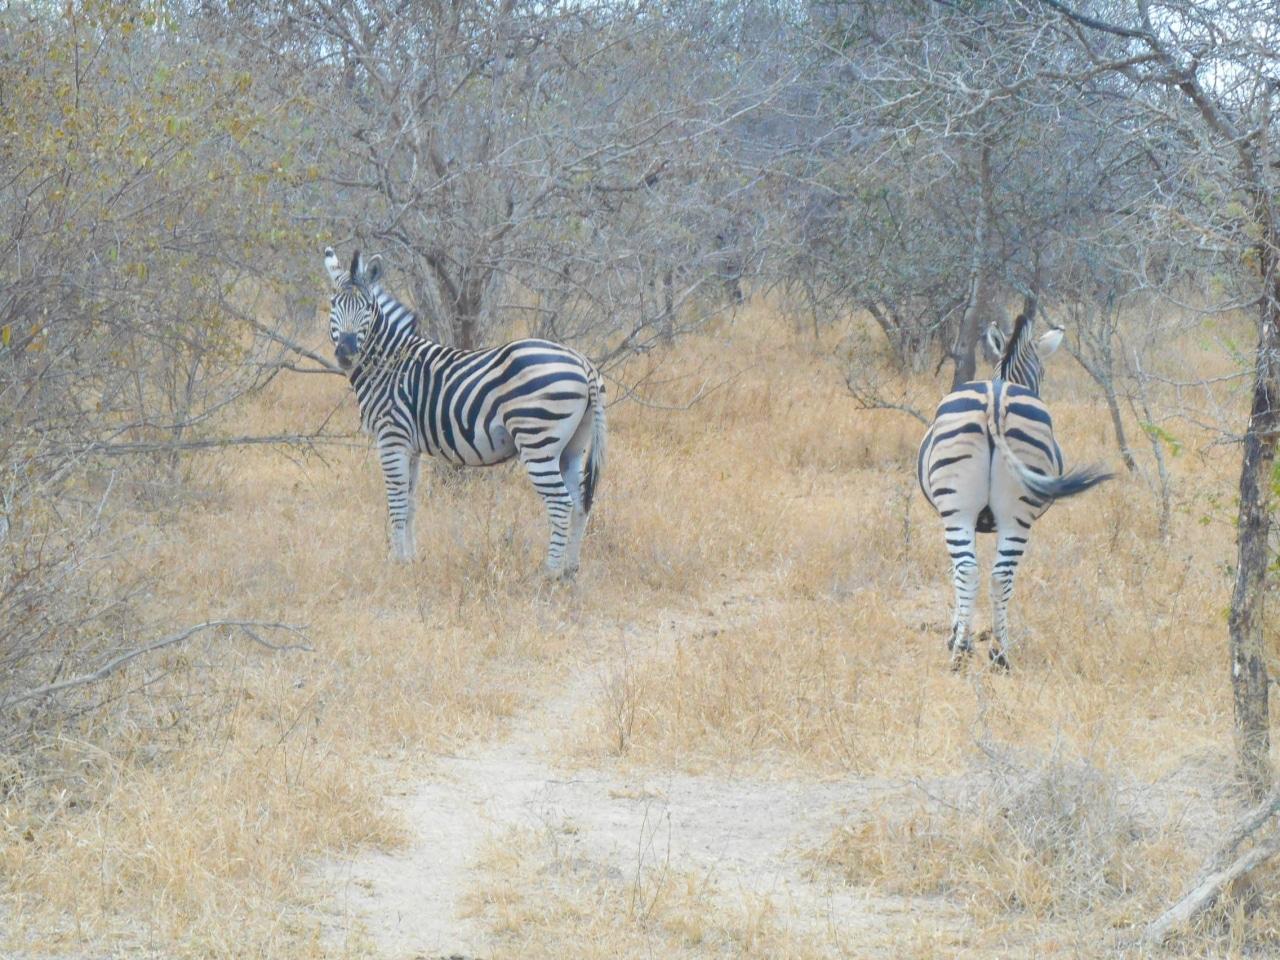 safari arrivee (5 sur 5)